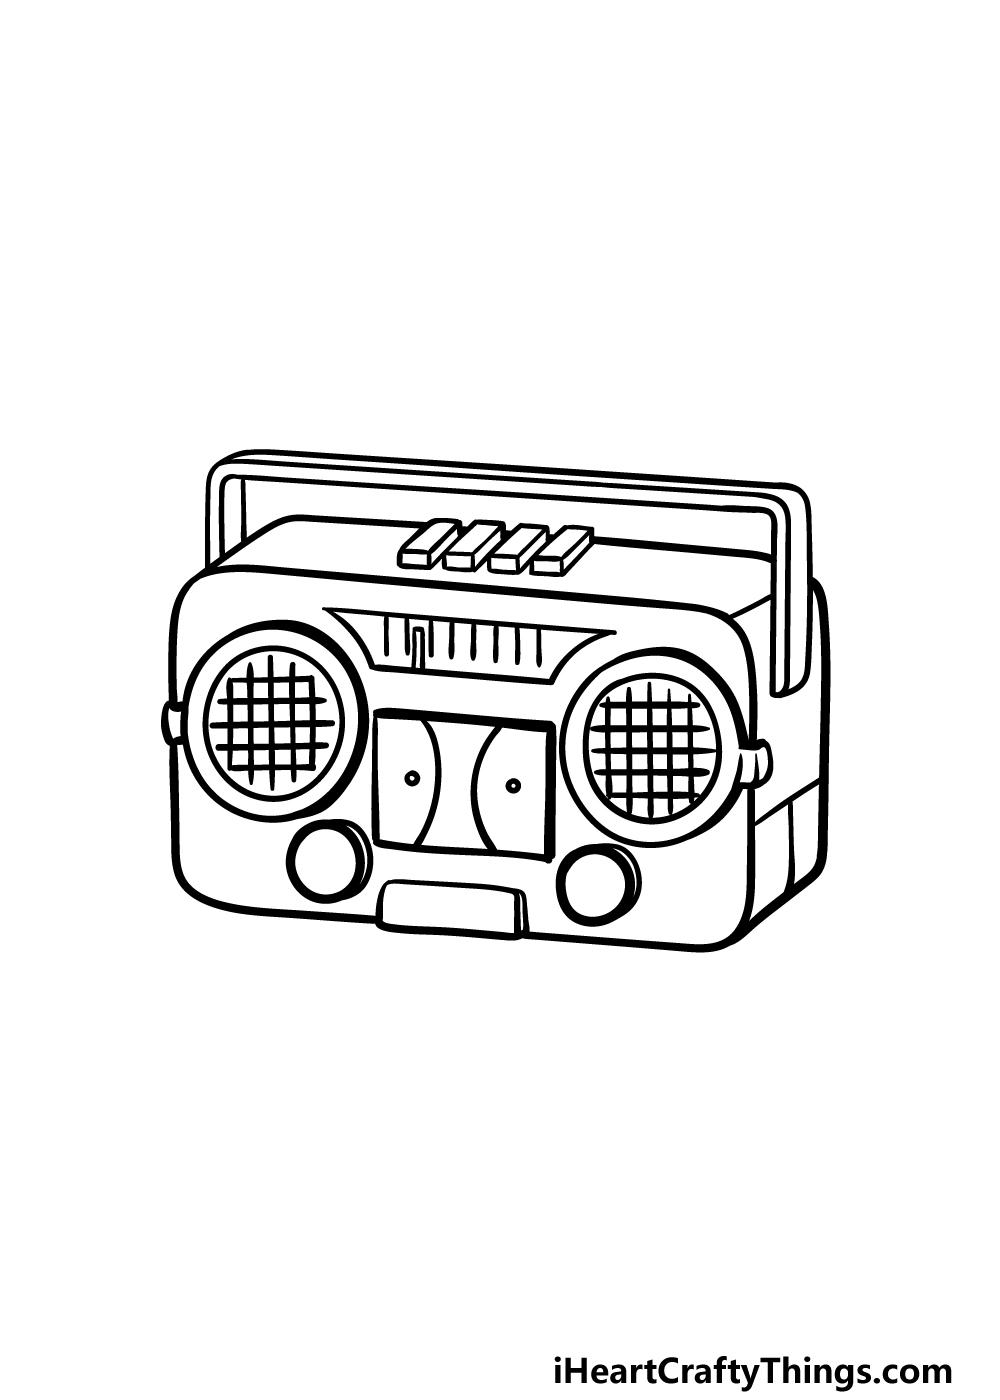 drawing a radio step 5